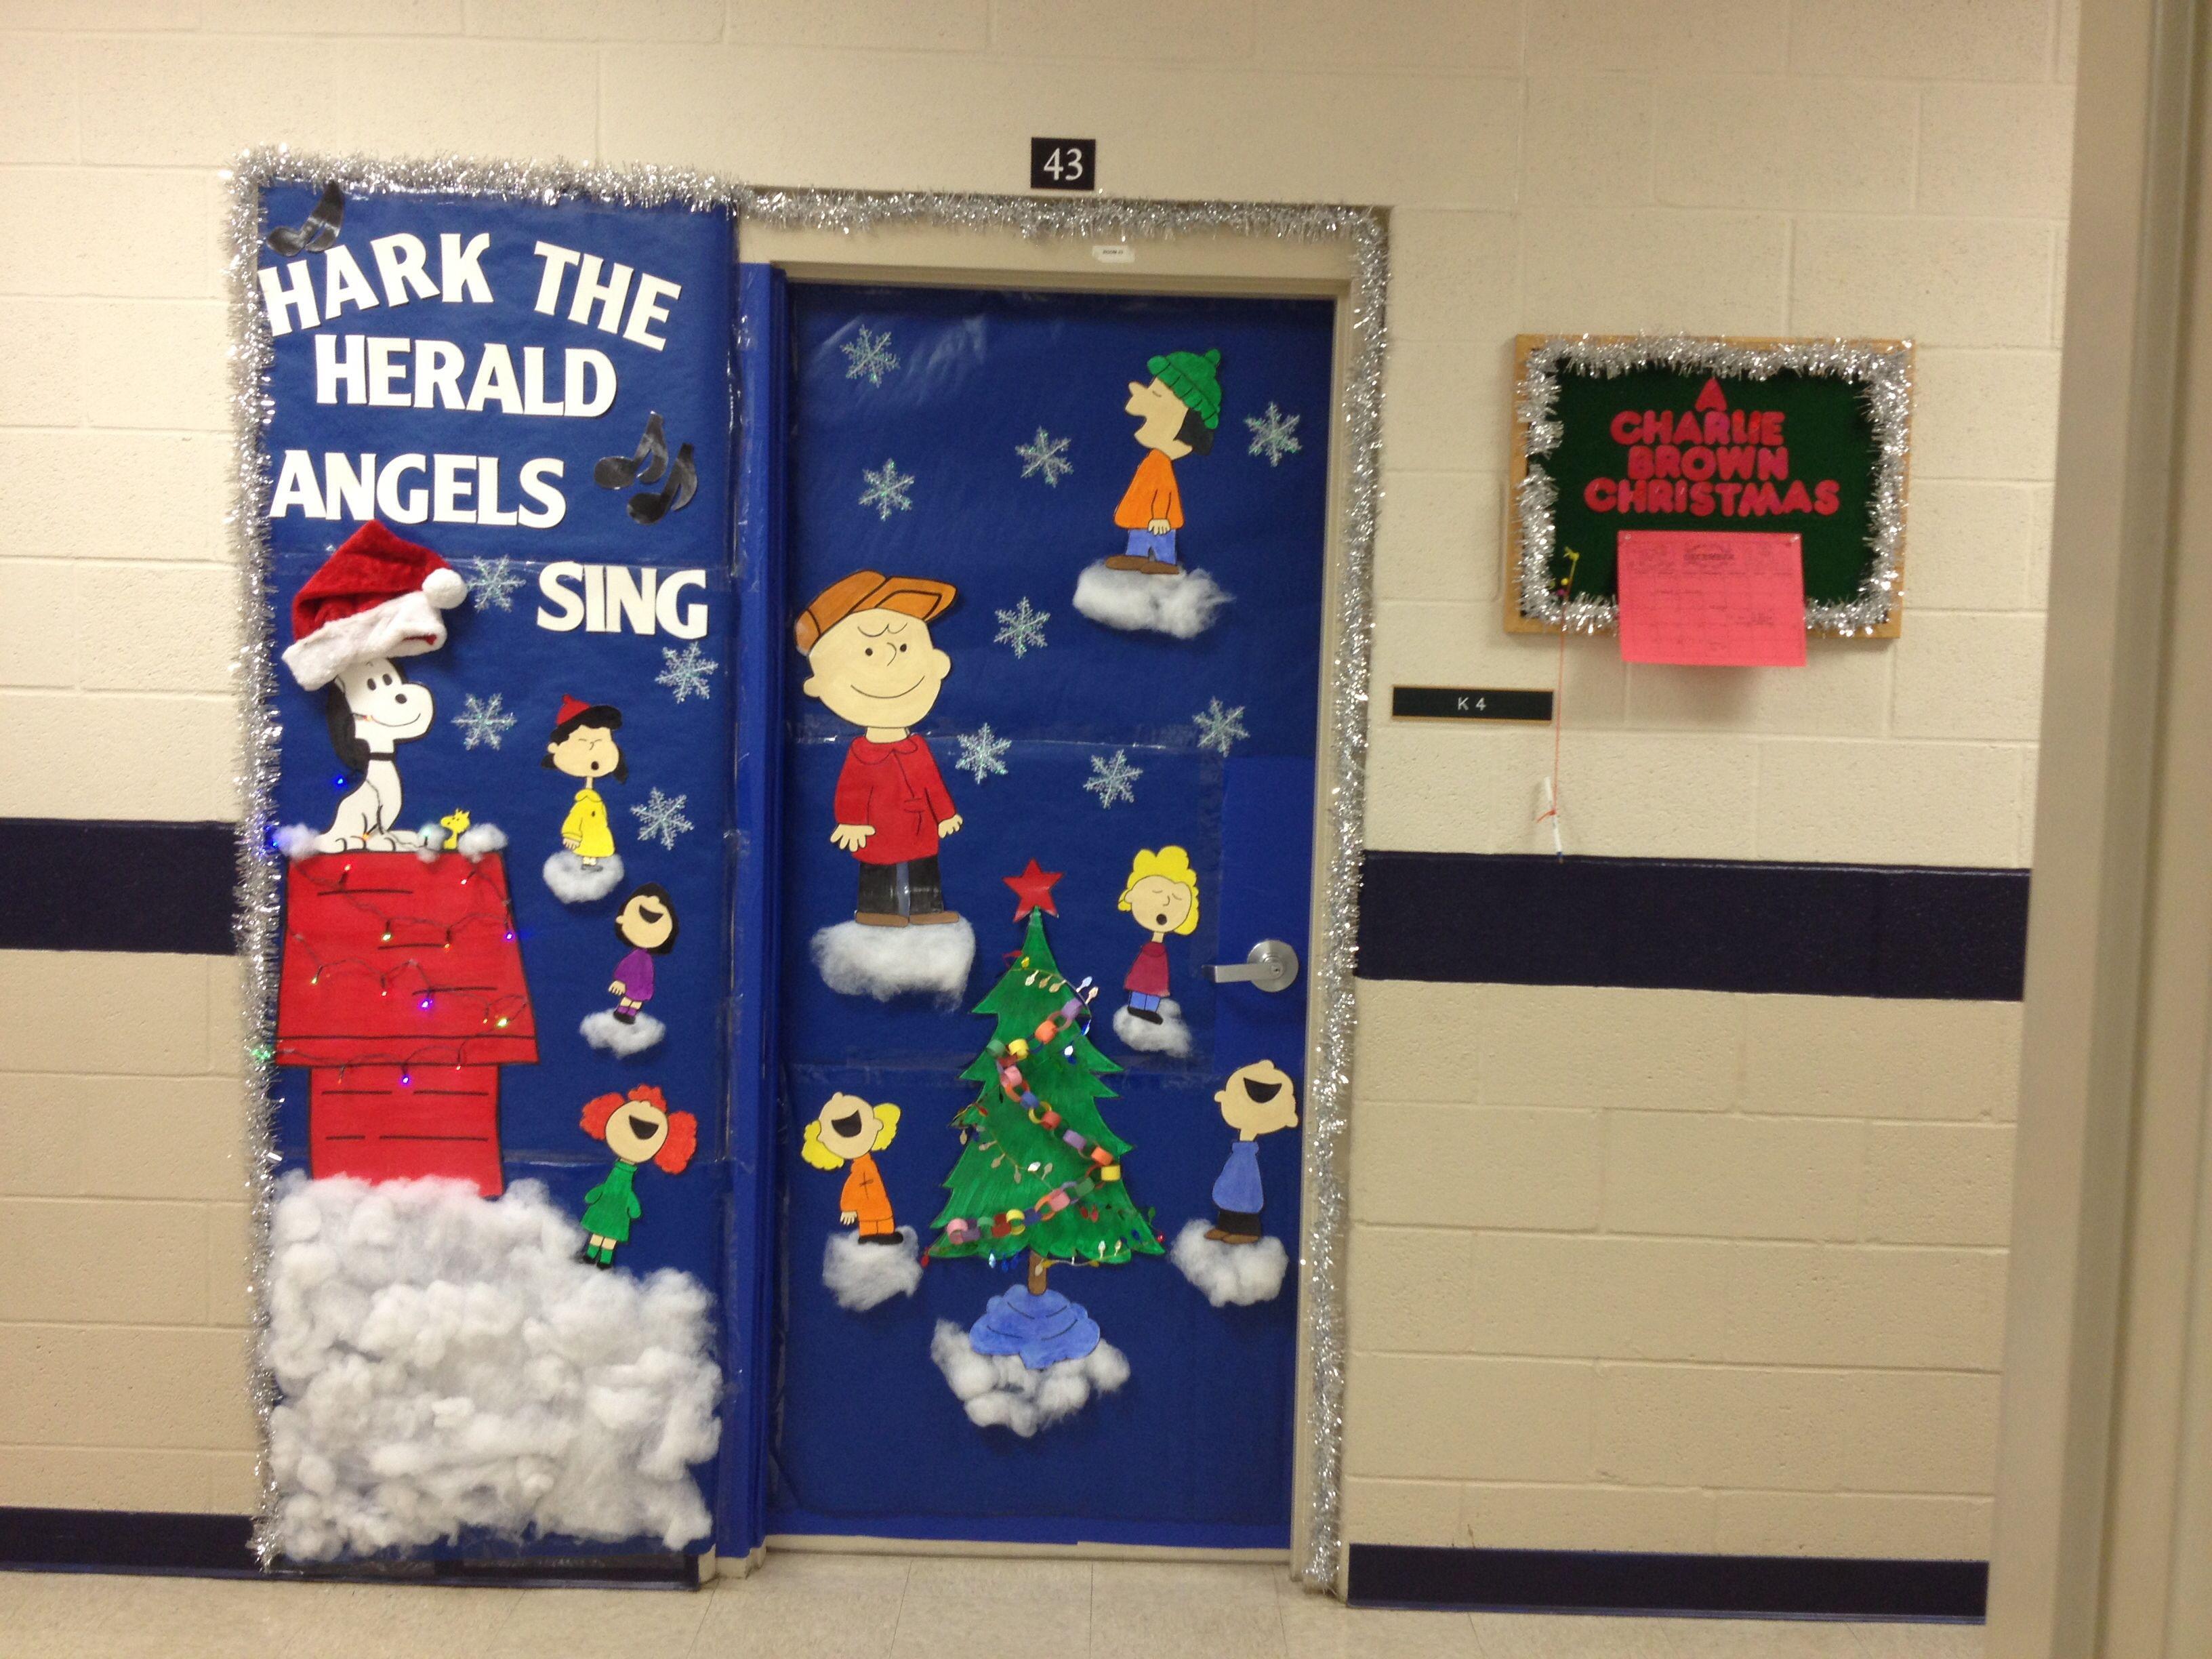 Charlie Brown Christmas Hark The Herald Angels Sing